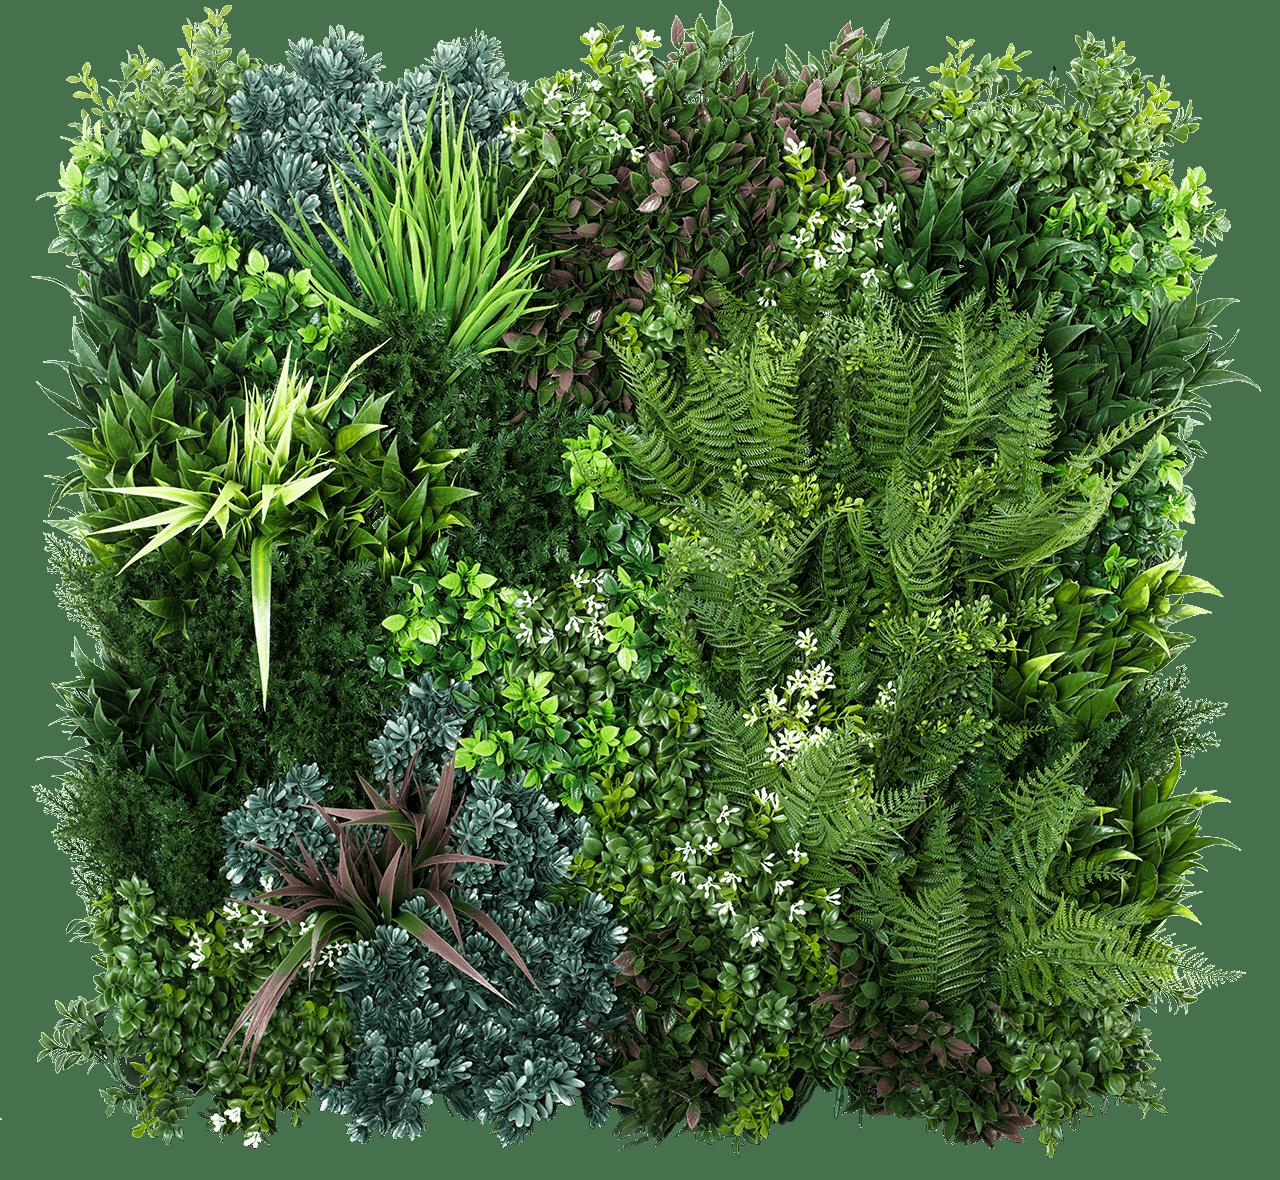 Vistafolia Green Wall Panels Uk Artificial Green Wall Artificial Vertical Garden Artificial Plants Outdoor